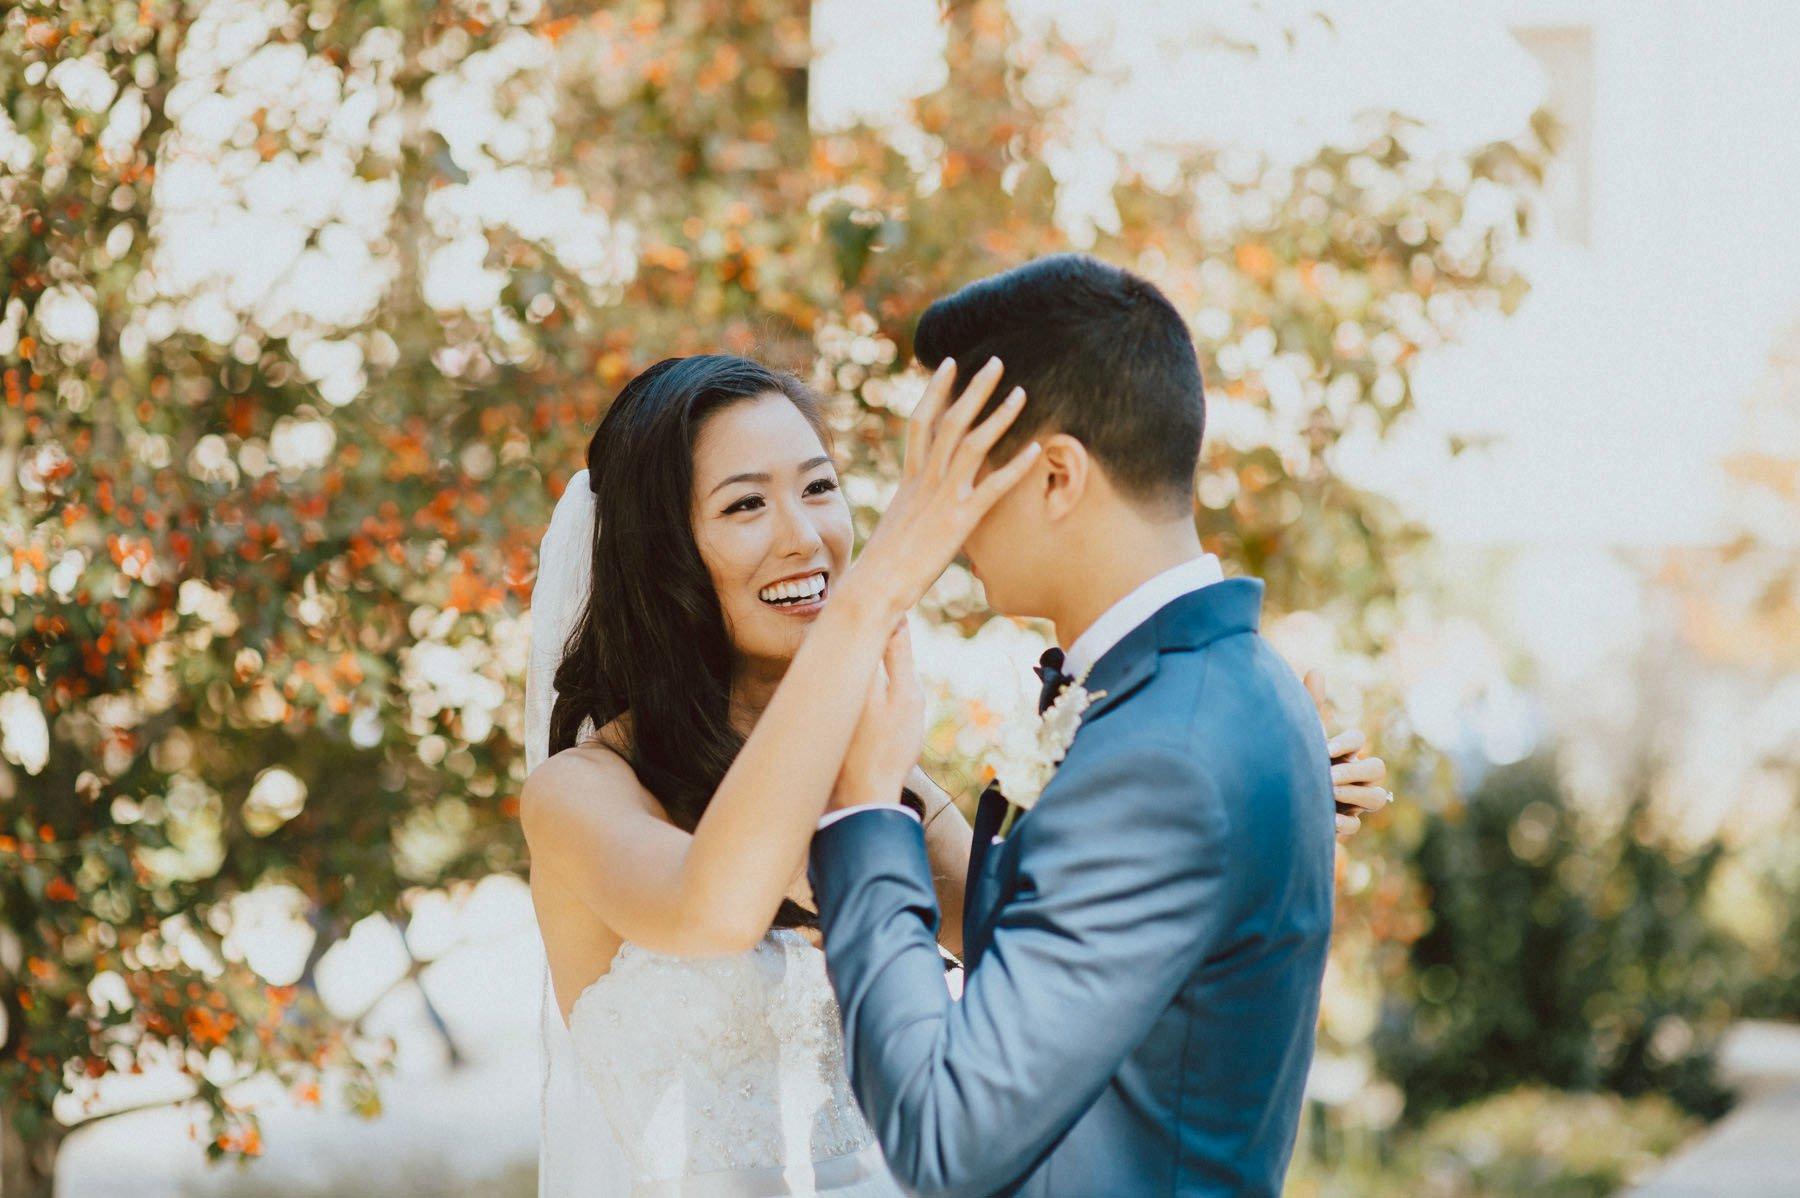 philadelphia-wedding-photographer-41.jpg